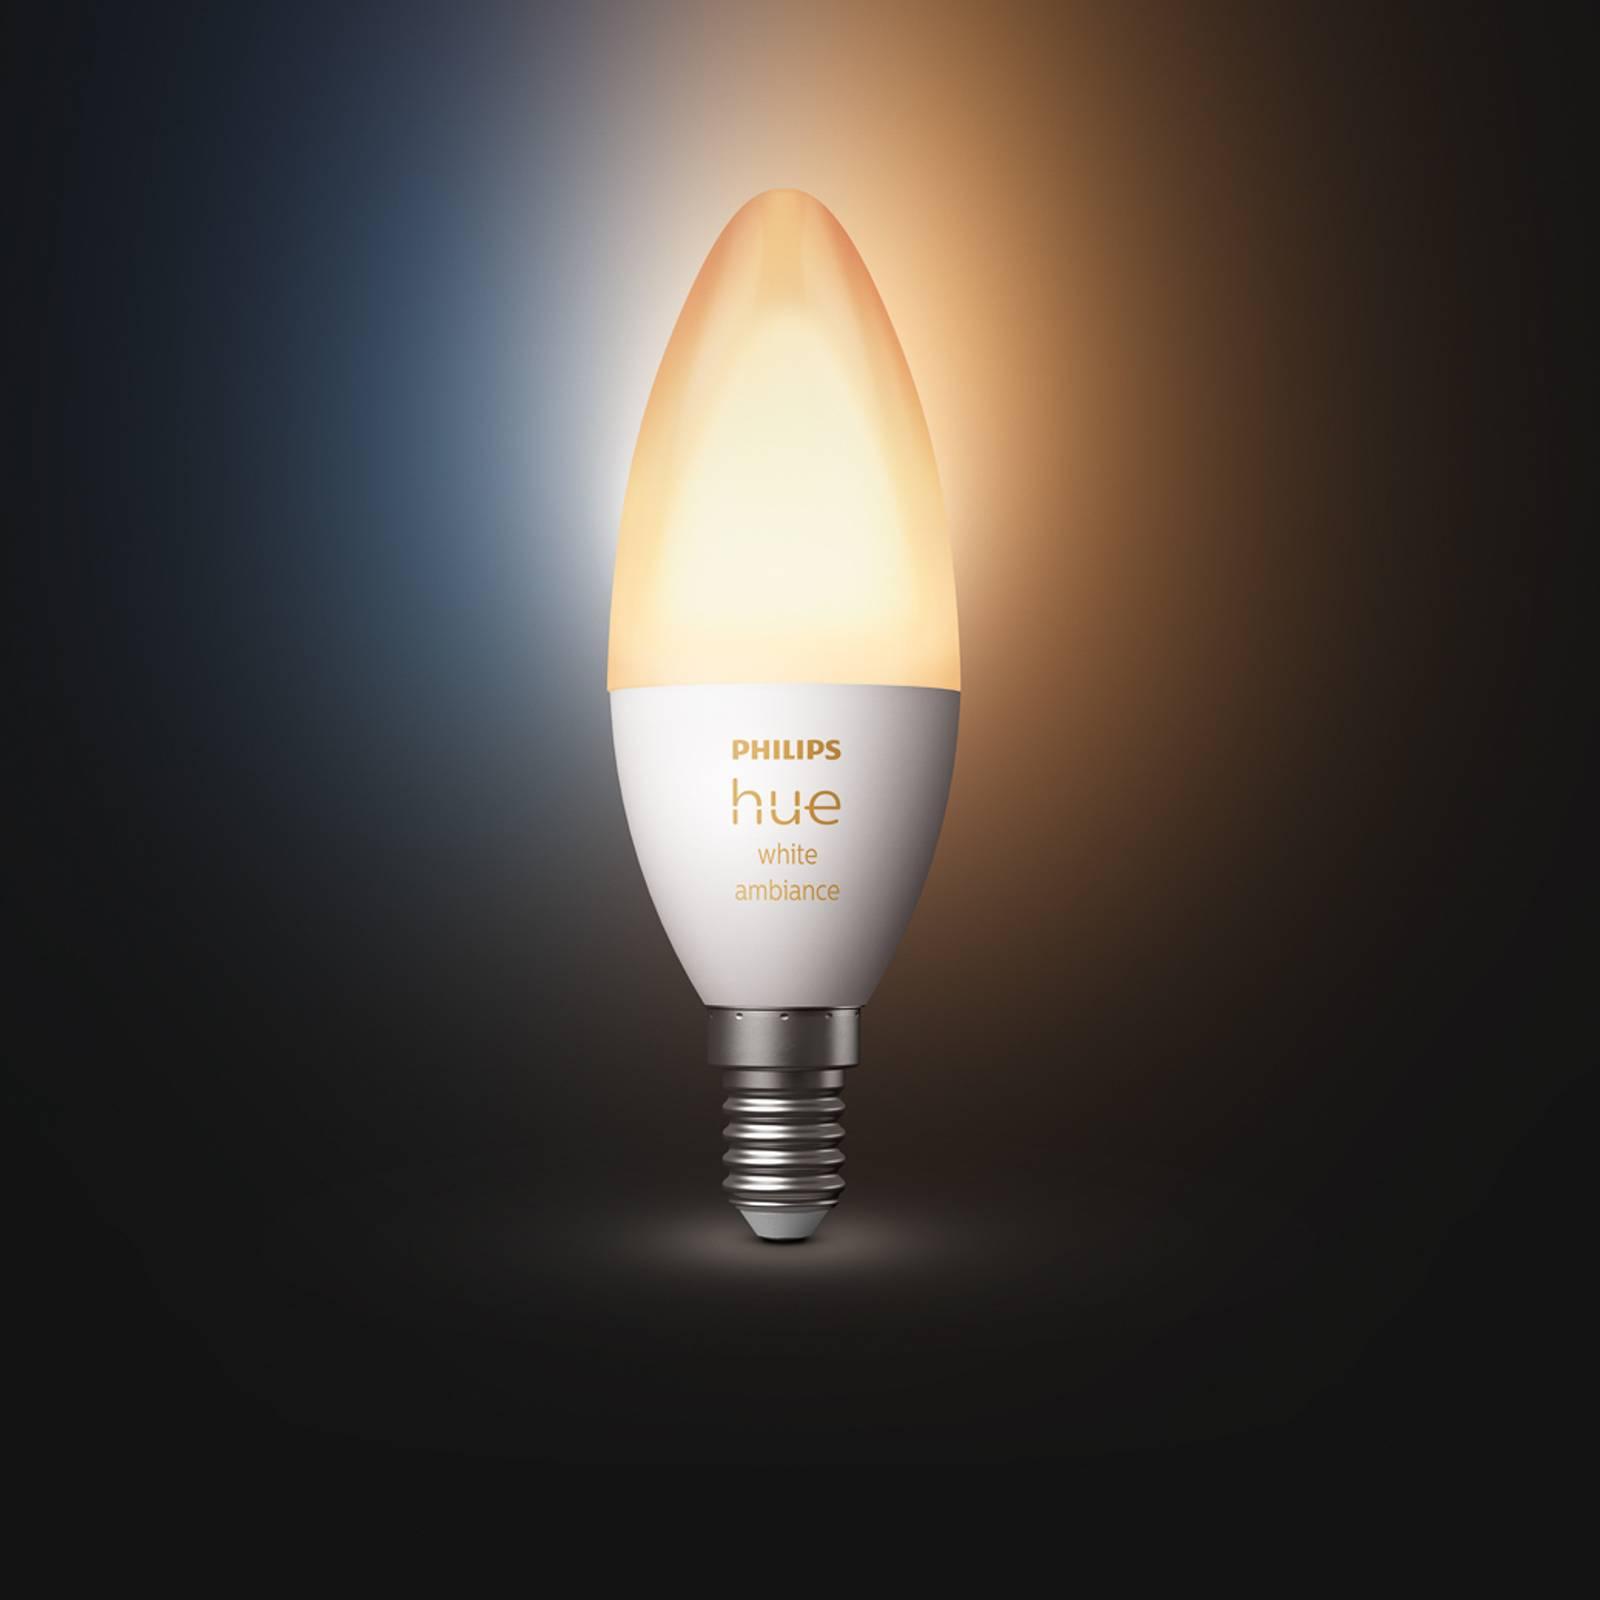 Philips Hue kynttilälamppu White Ambiance E14 5,2W